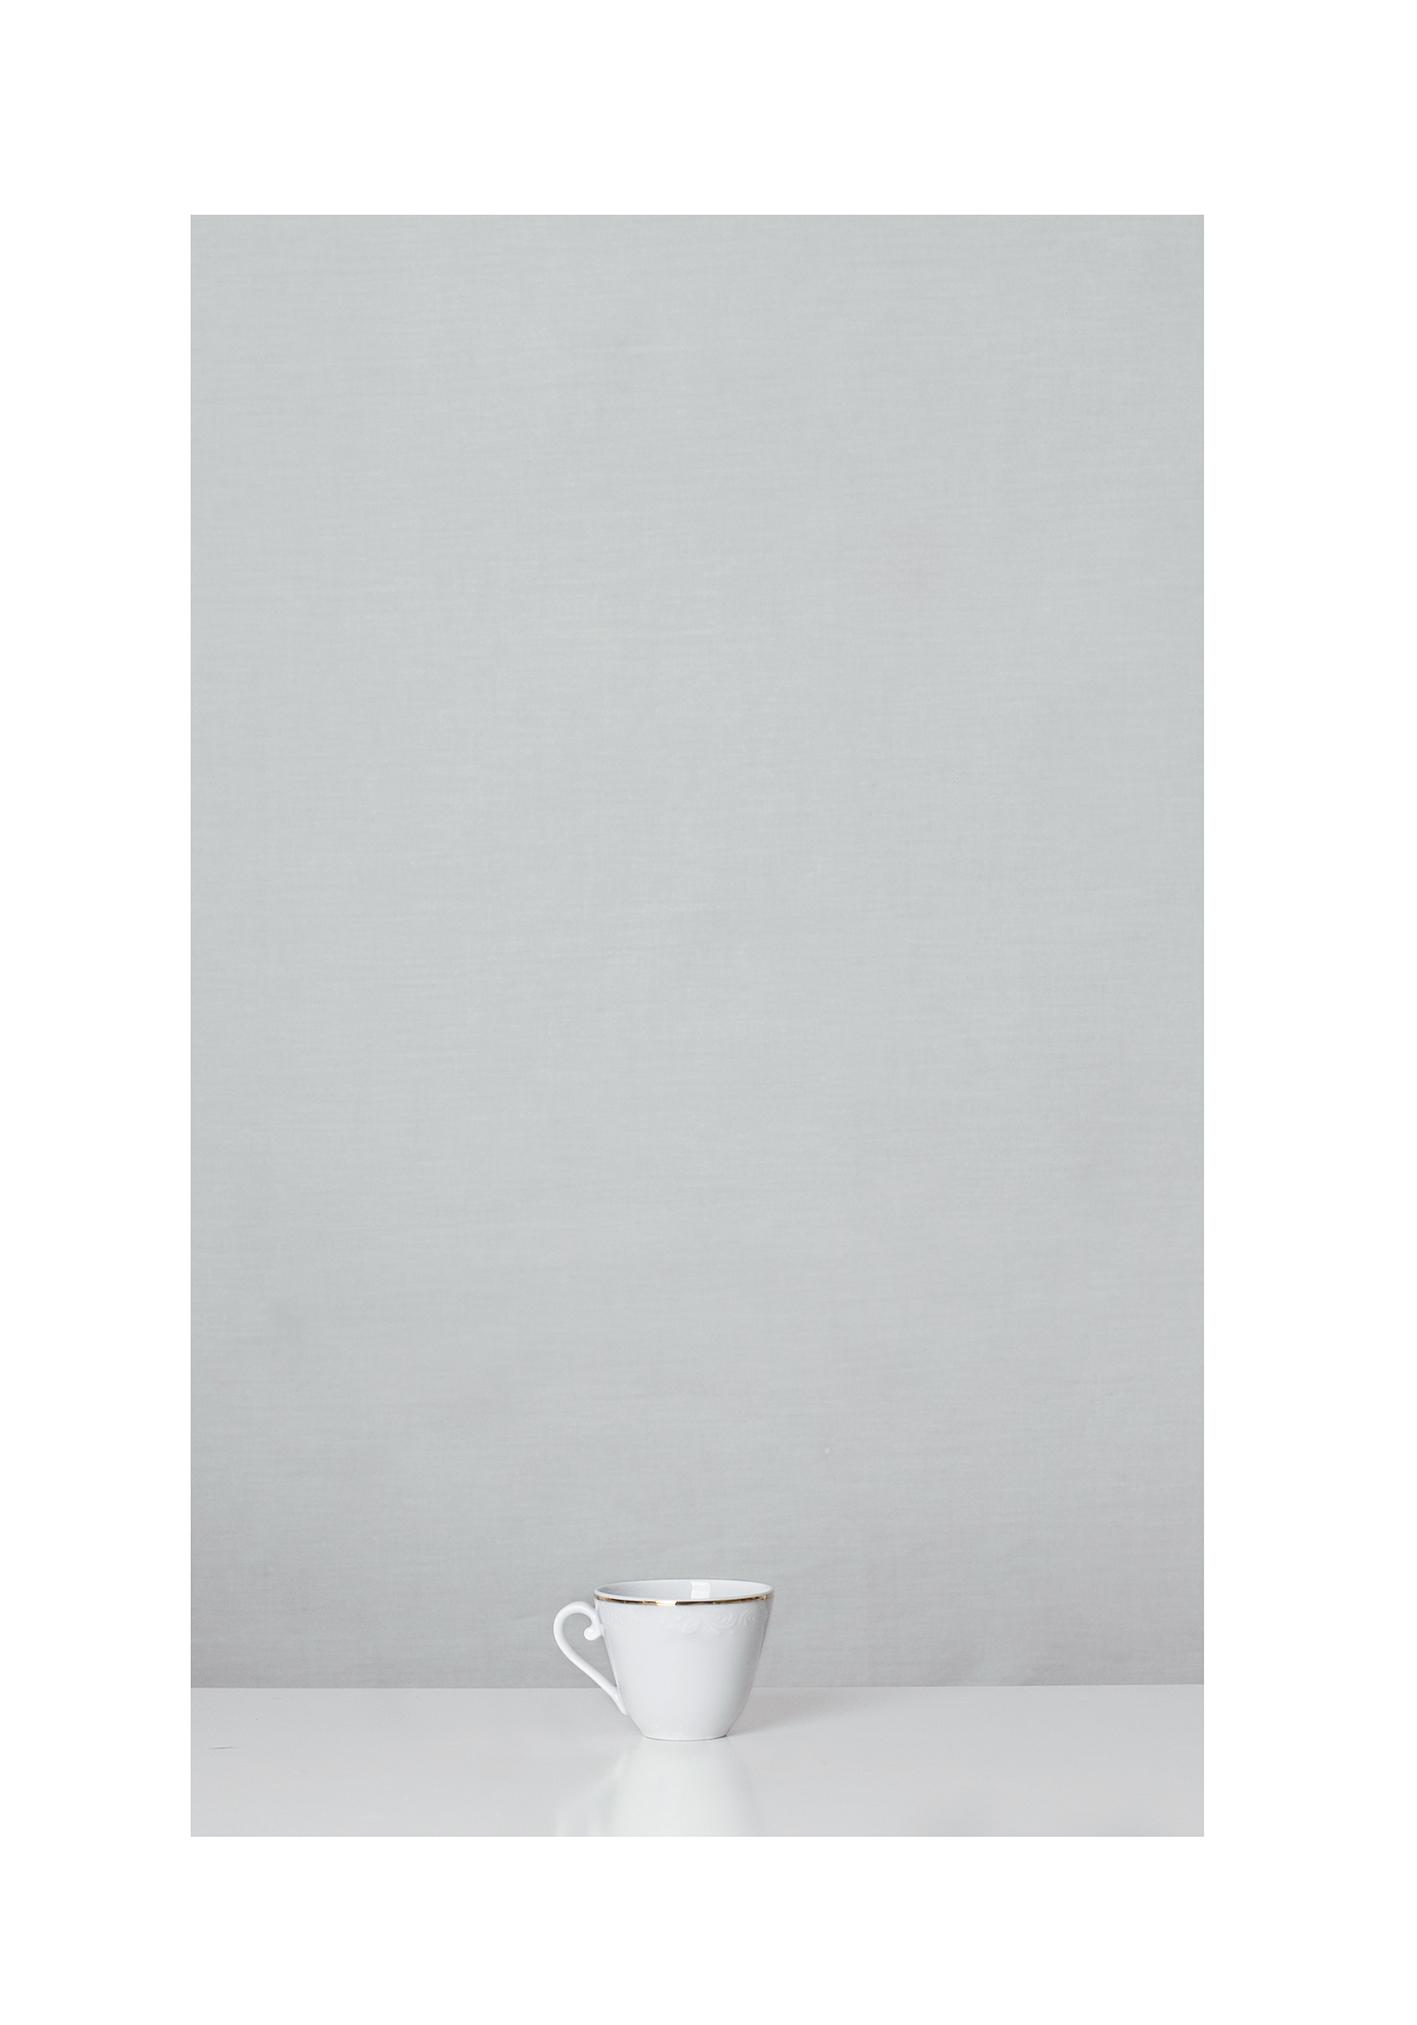 epifanía (2011) - Ana Frechilla, proyecto fotográfico de retratos